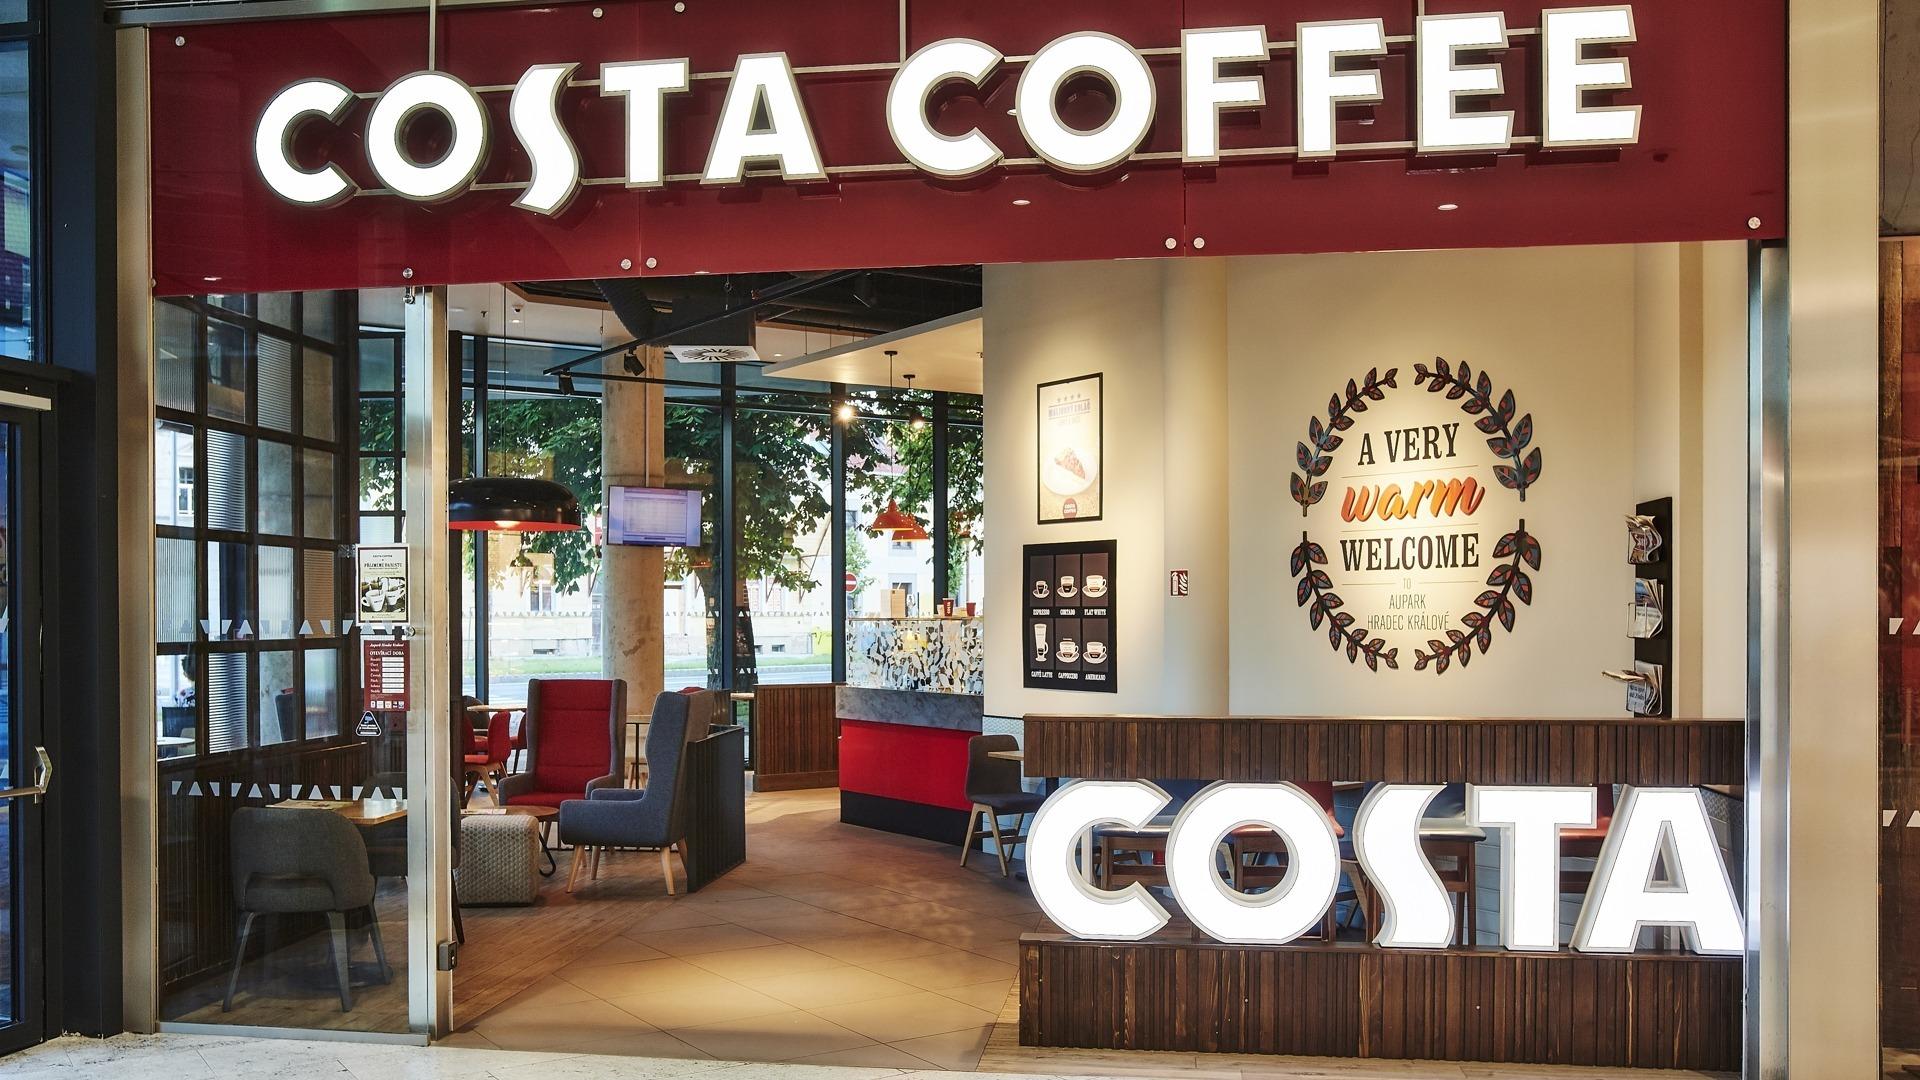 FESCHU Costa Coffee Aupark Hradec Králové vstup logo